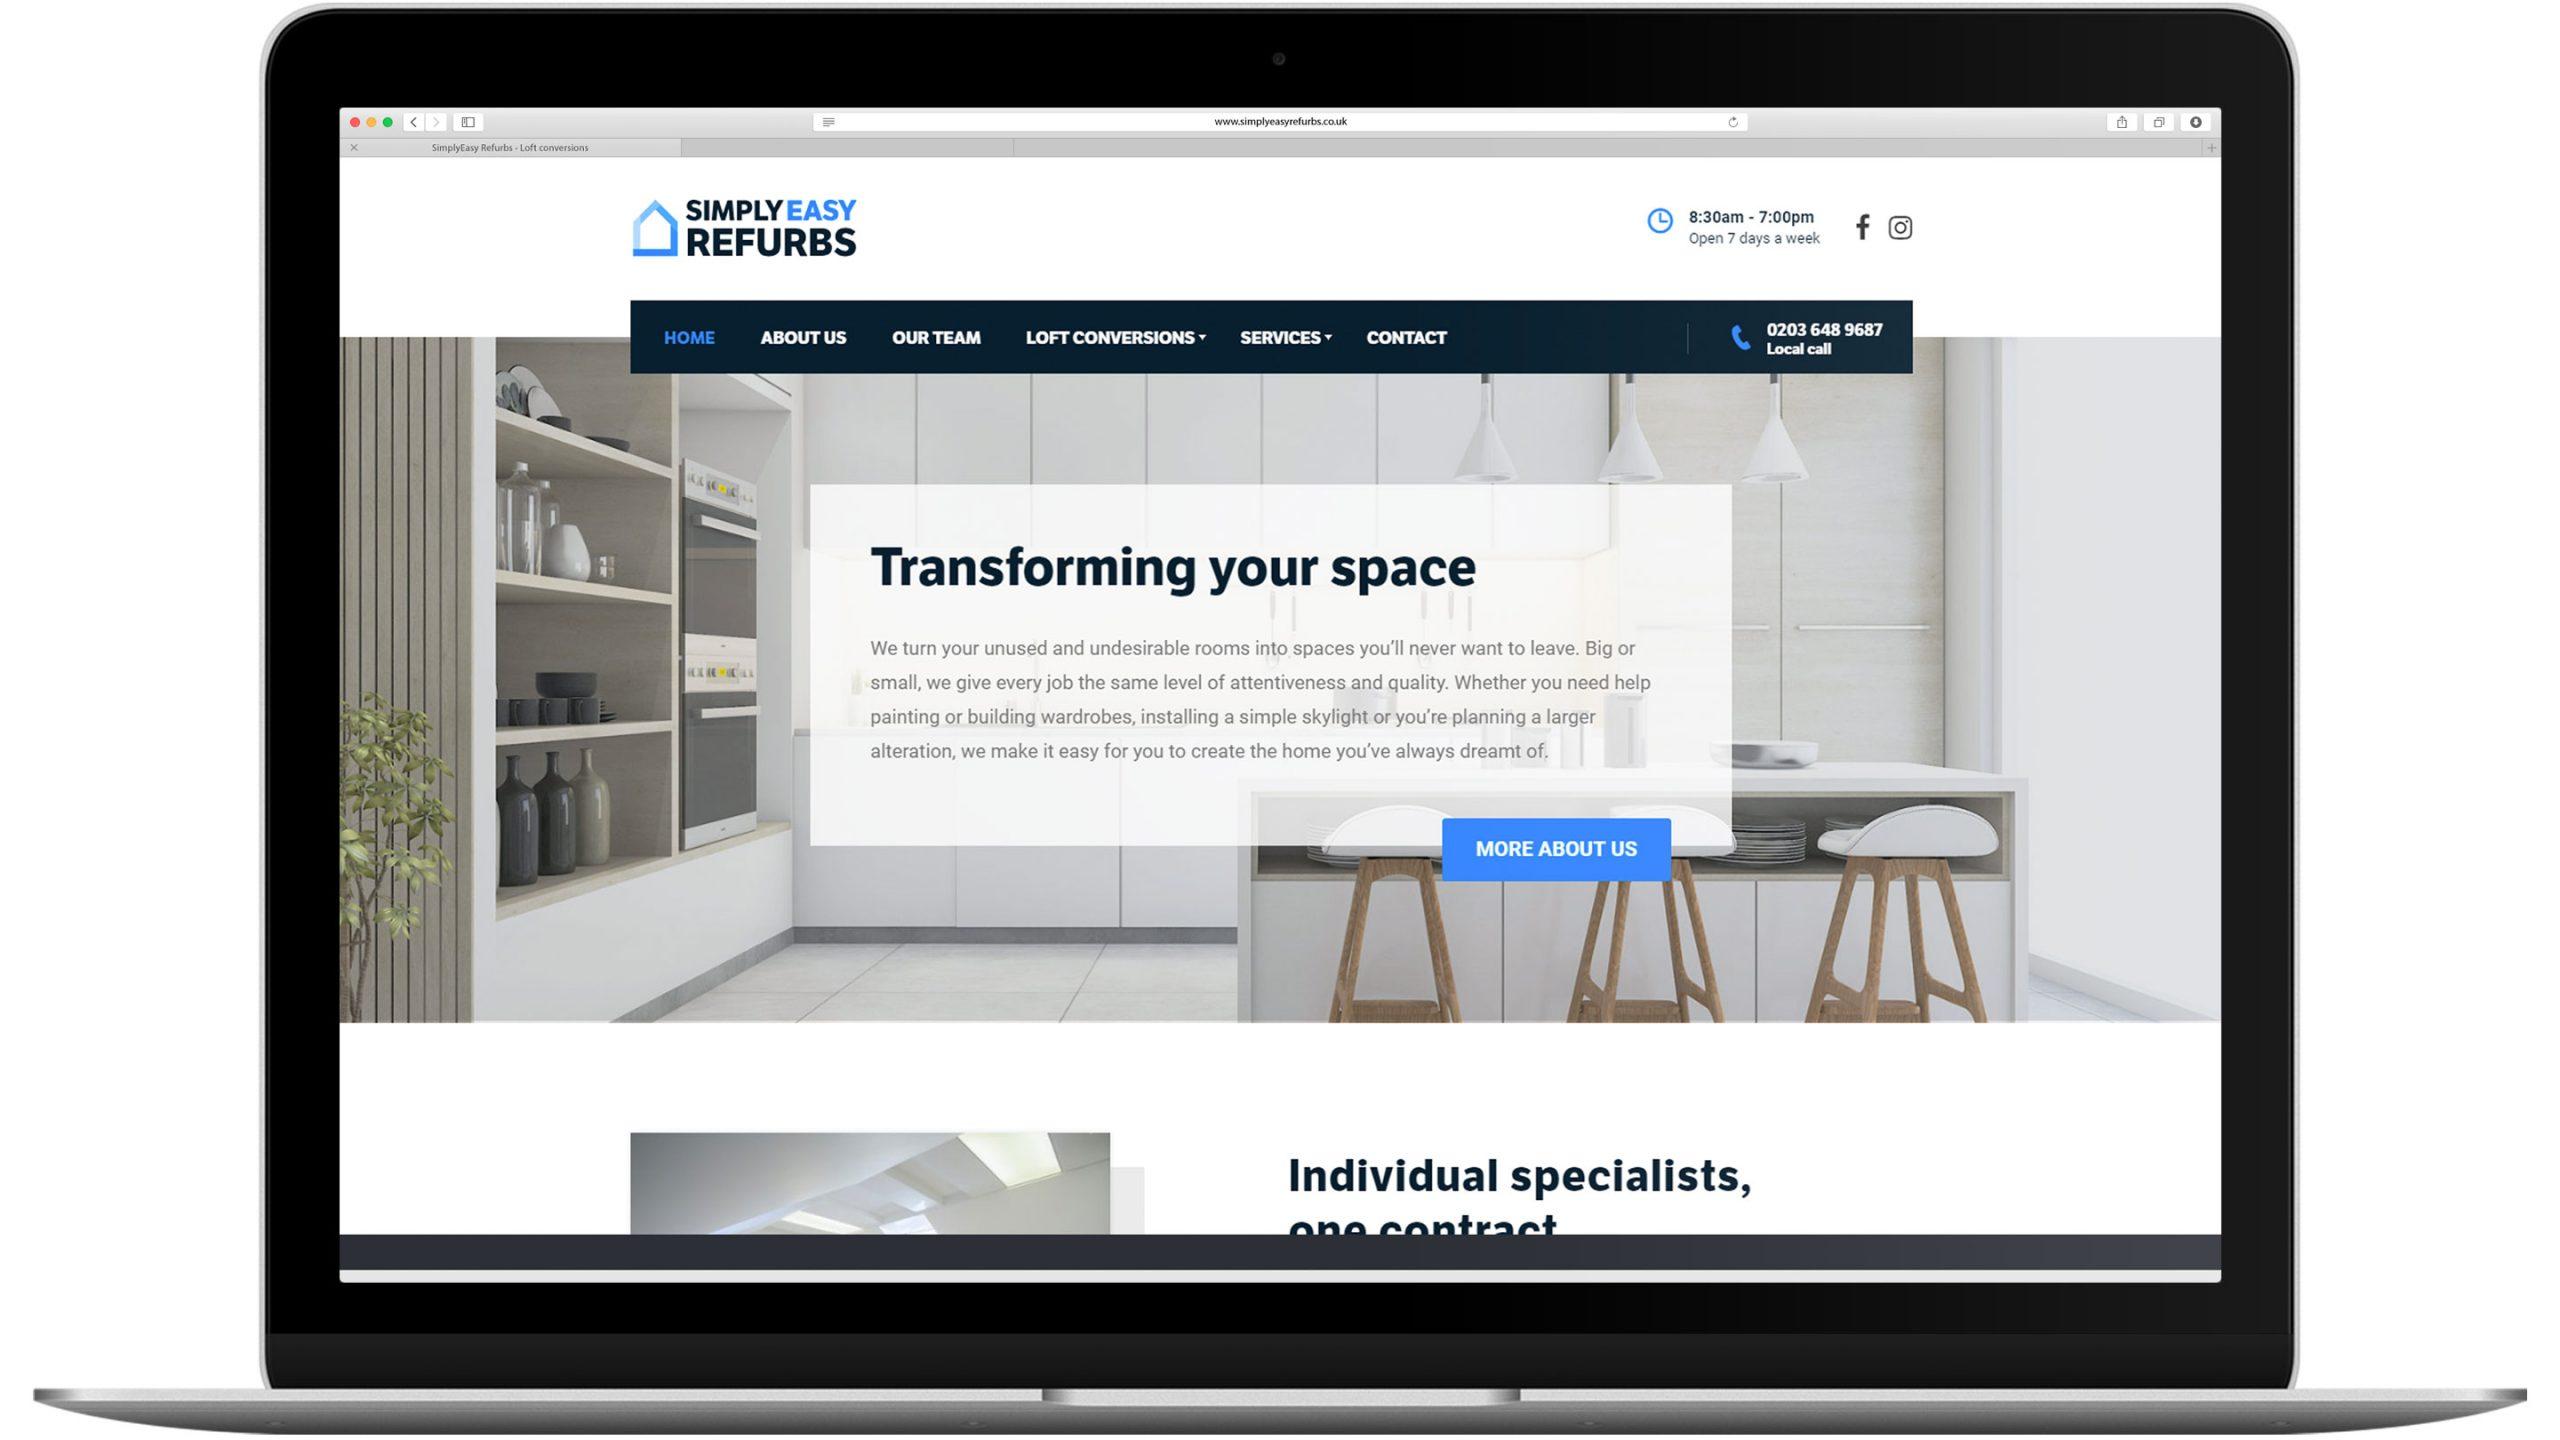 simplyeasy refurb homepage